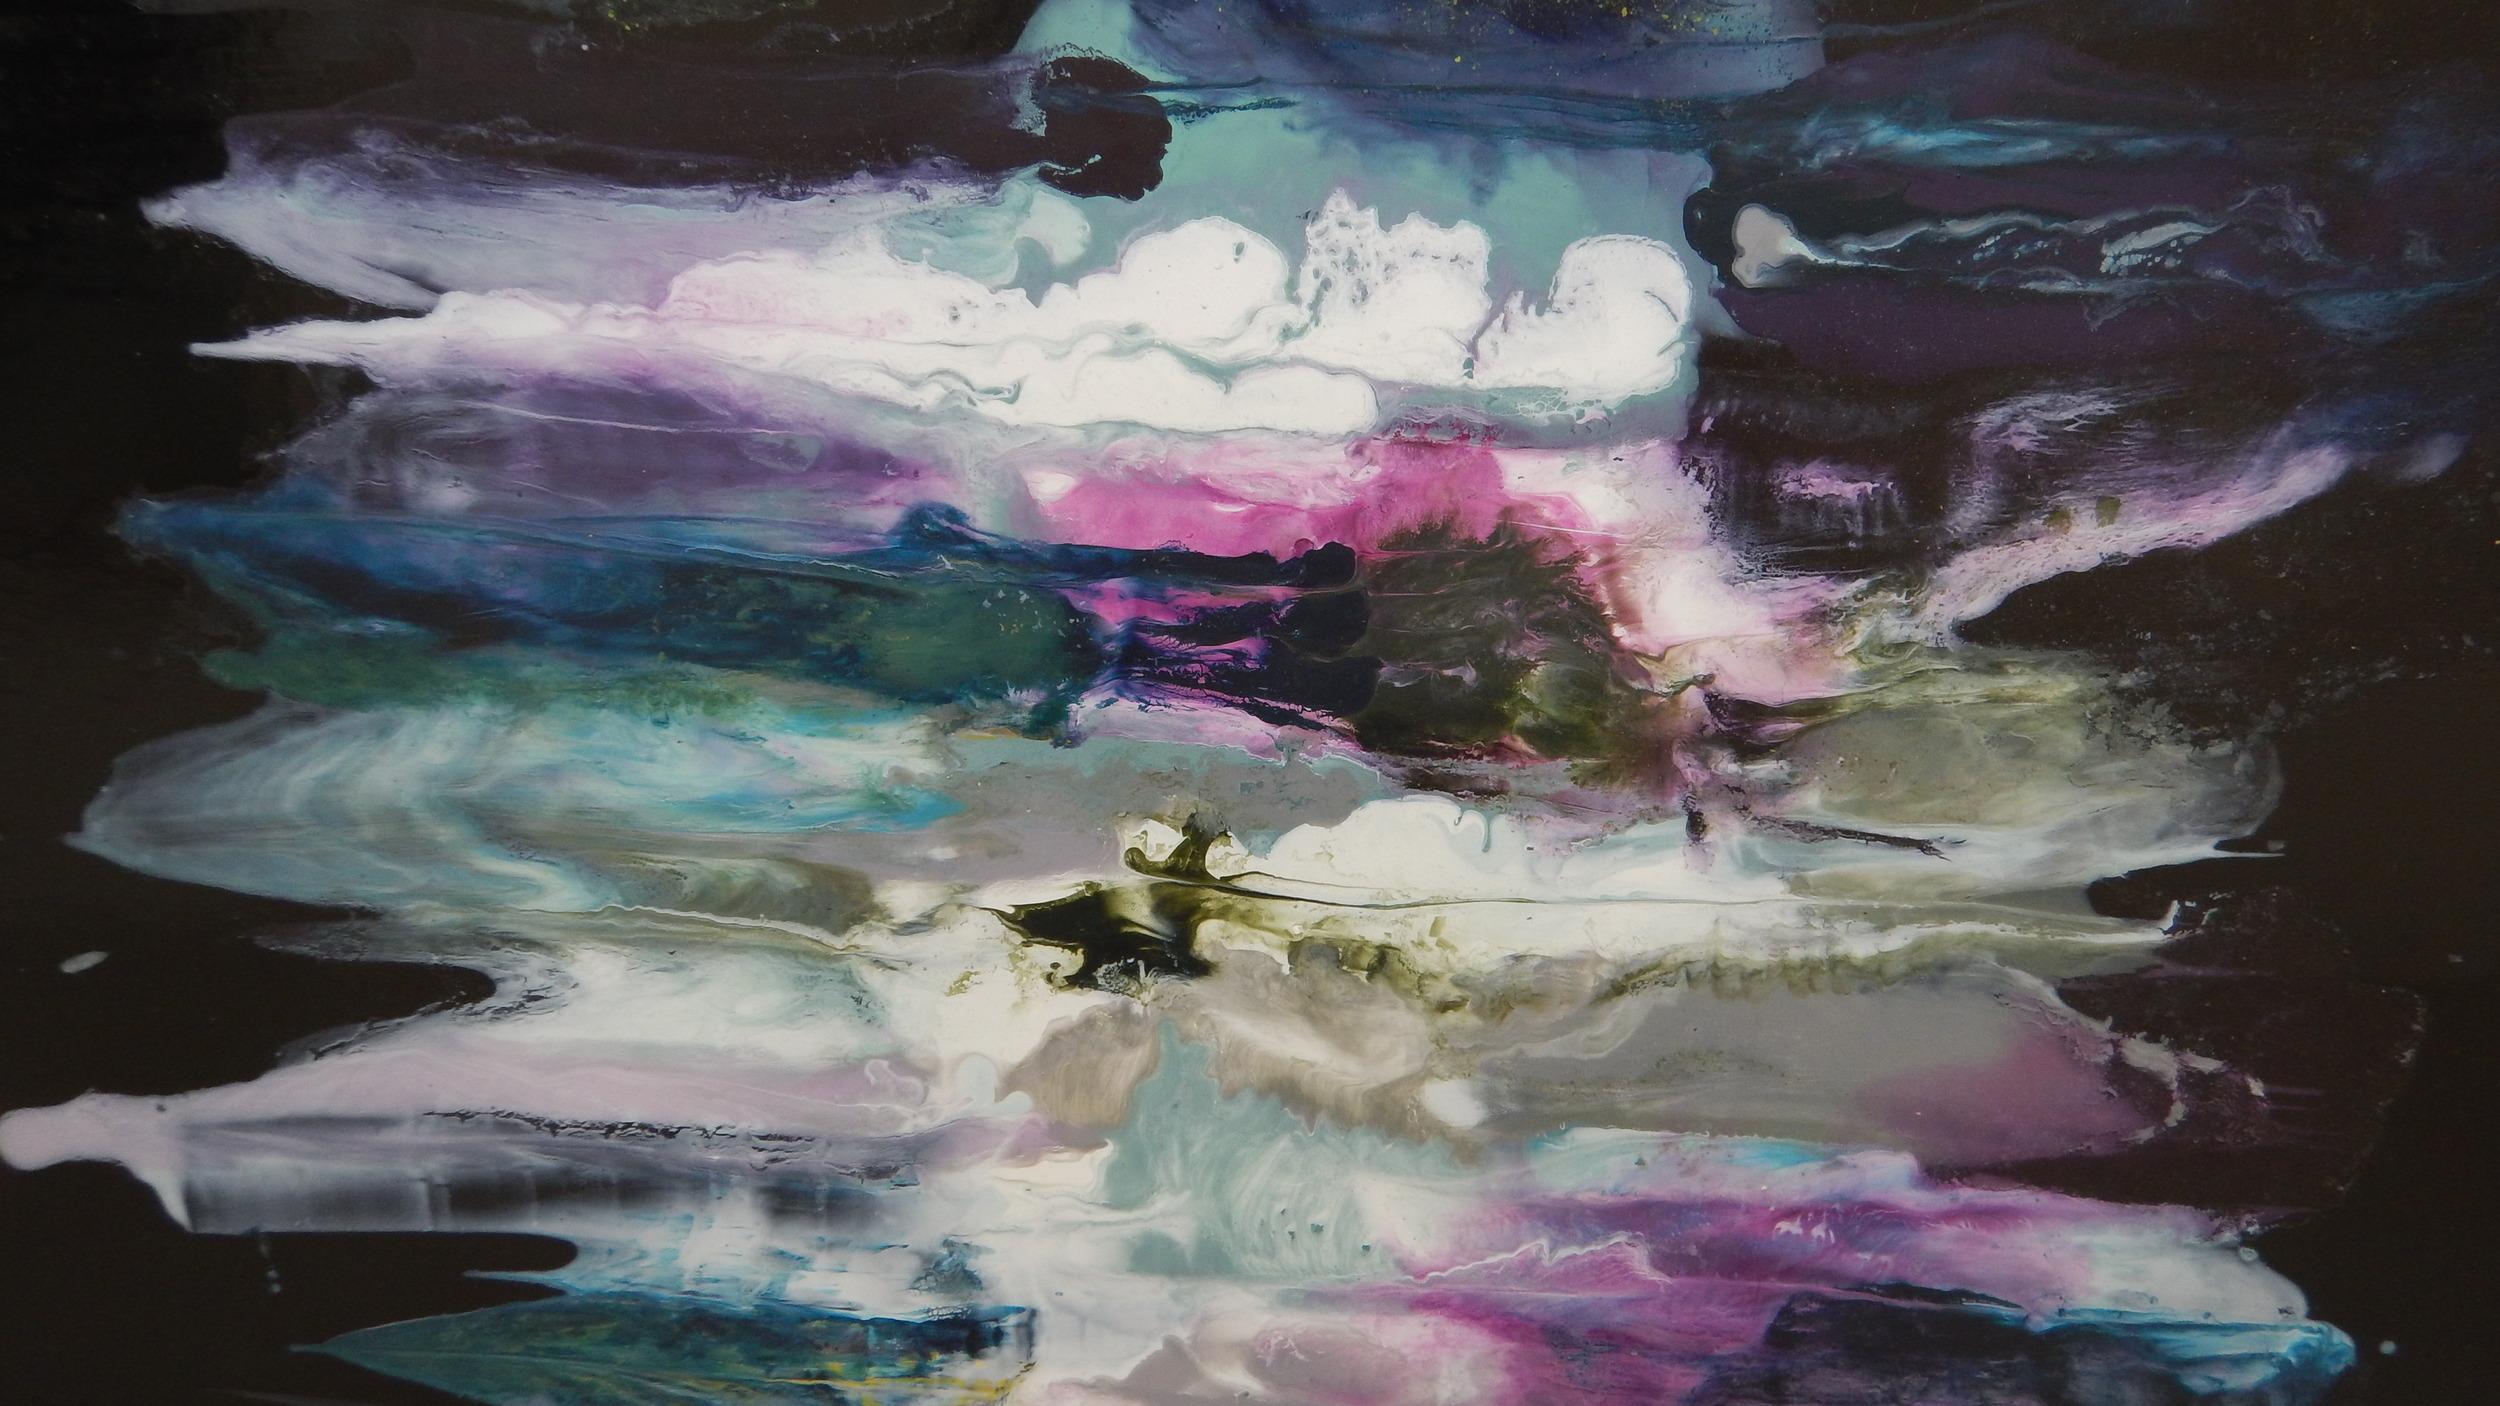 A close-up of Sian Egan's work